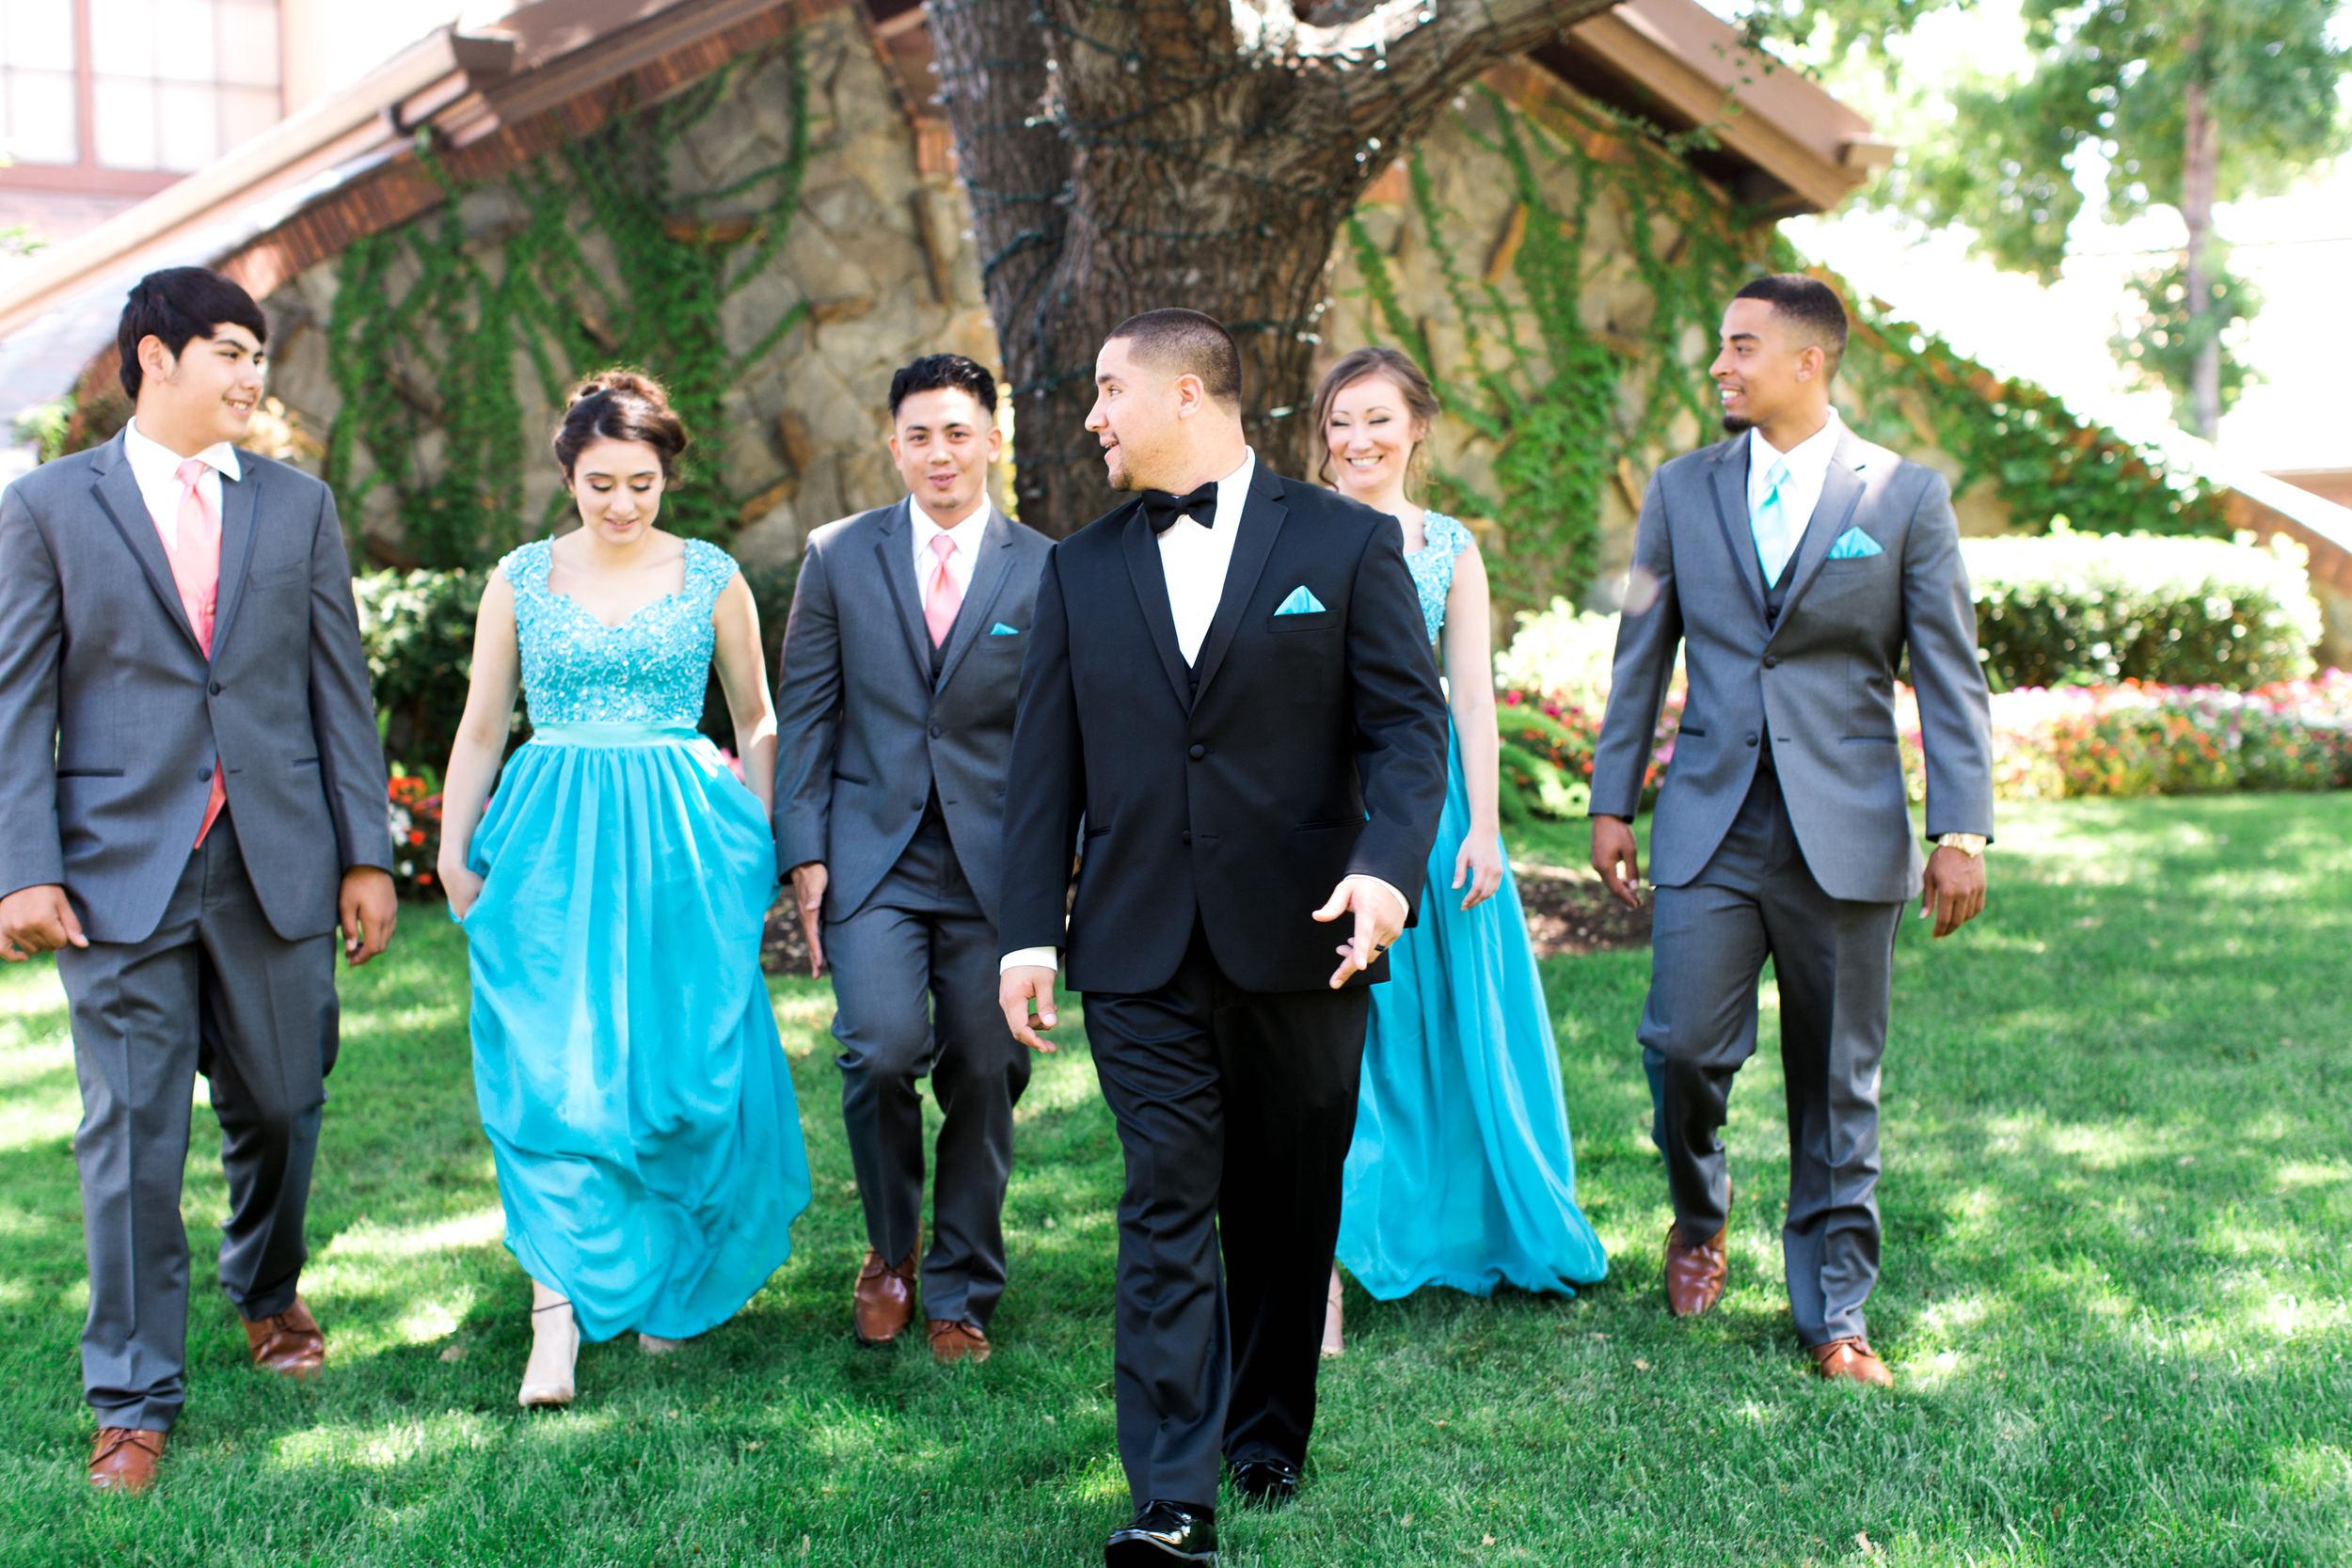 hawaiian-inspired-wedding-at-blackhawk-country-club-1341.jpg